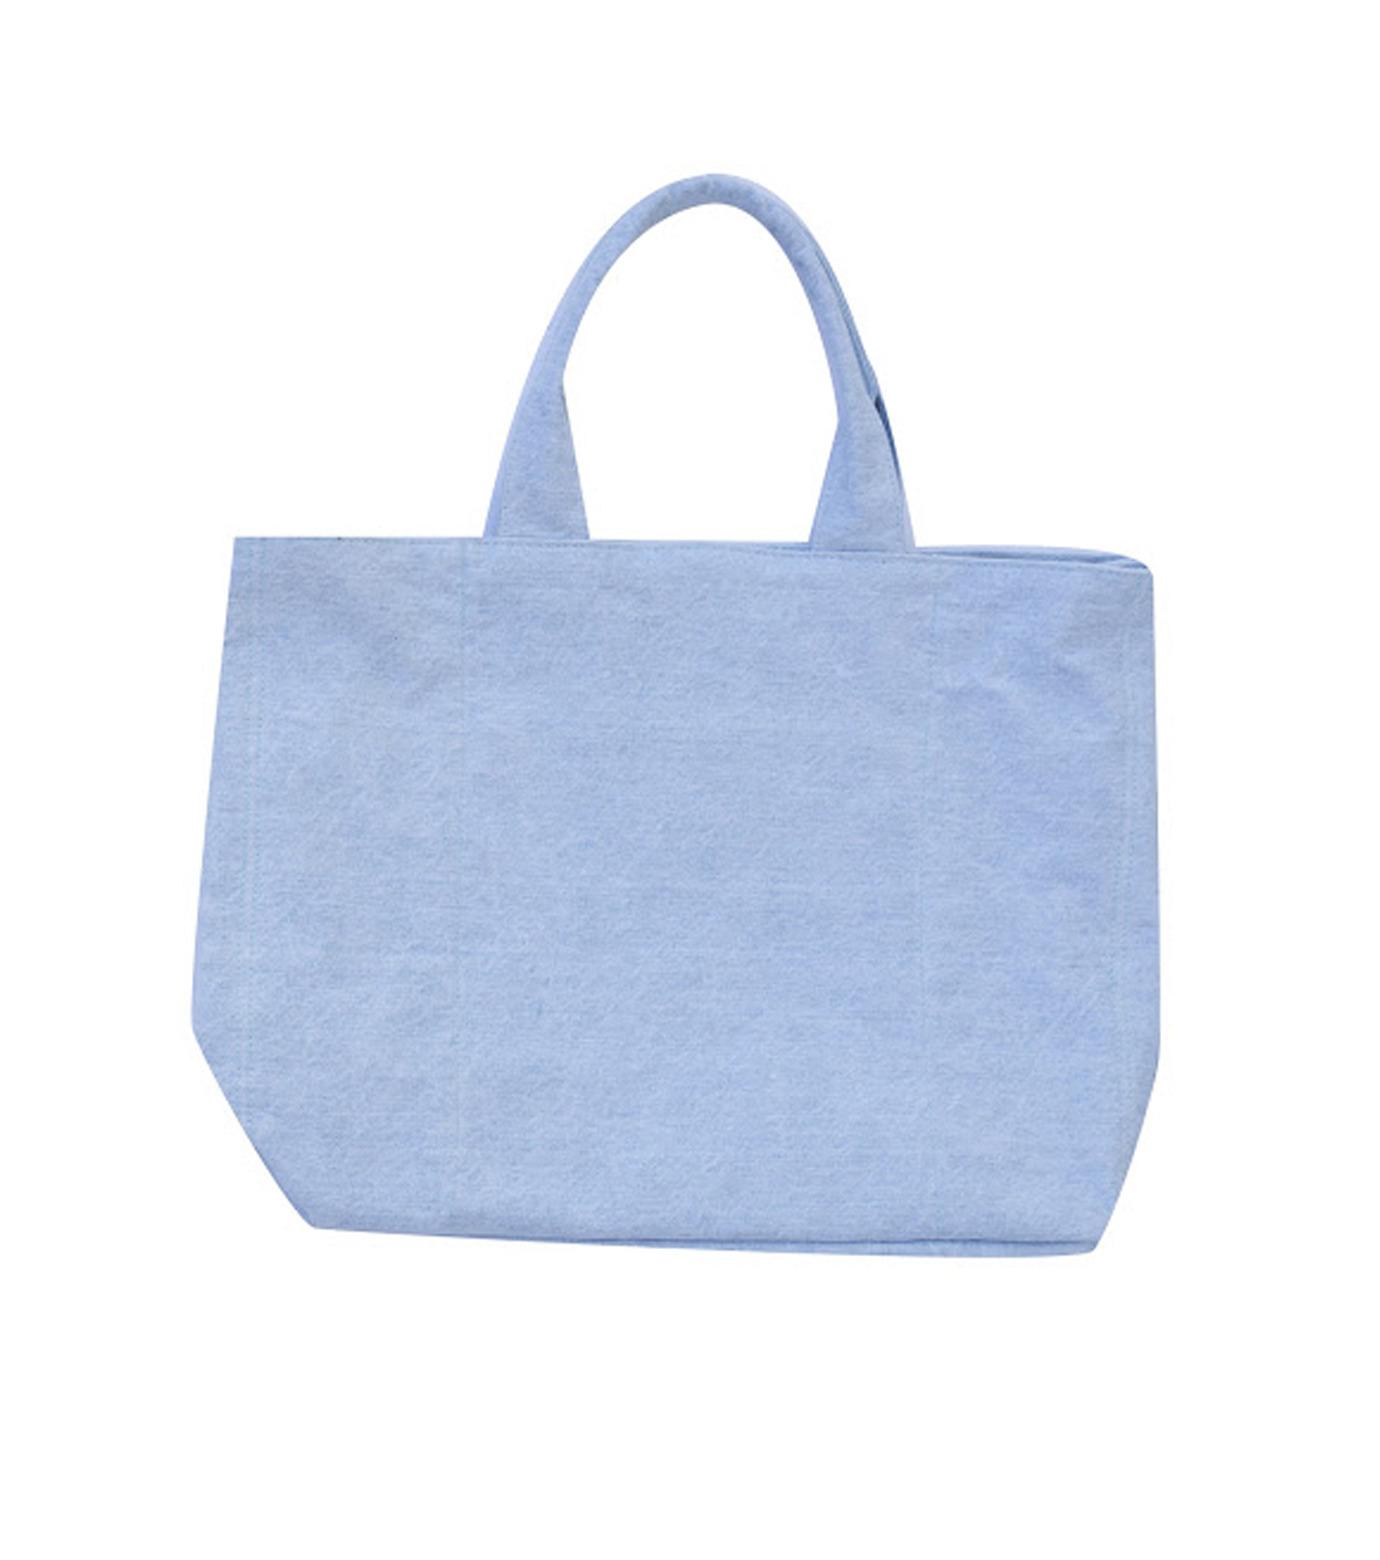 Richardson Magazine(リチャードソン マガジン)のDenim Tote-BLUE(ハンドバッグ/hand bag)-AW16011-92 拡大詳細画像2